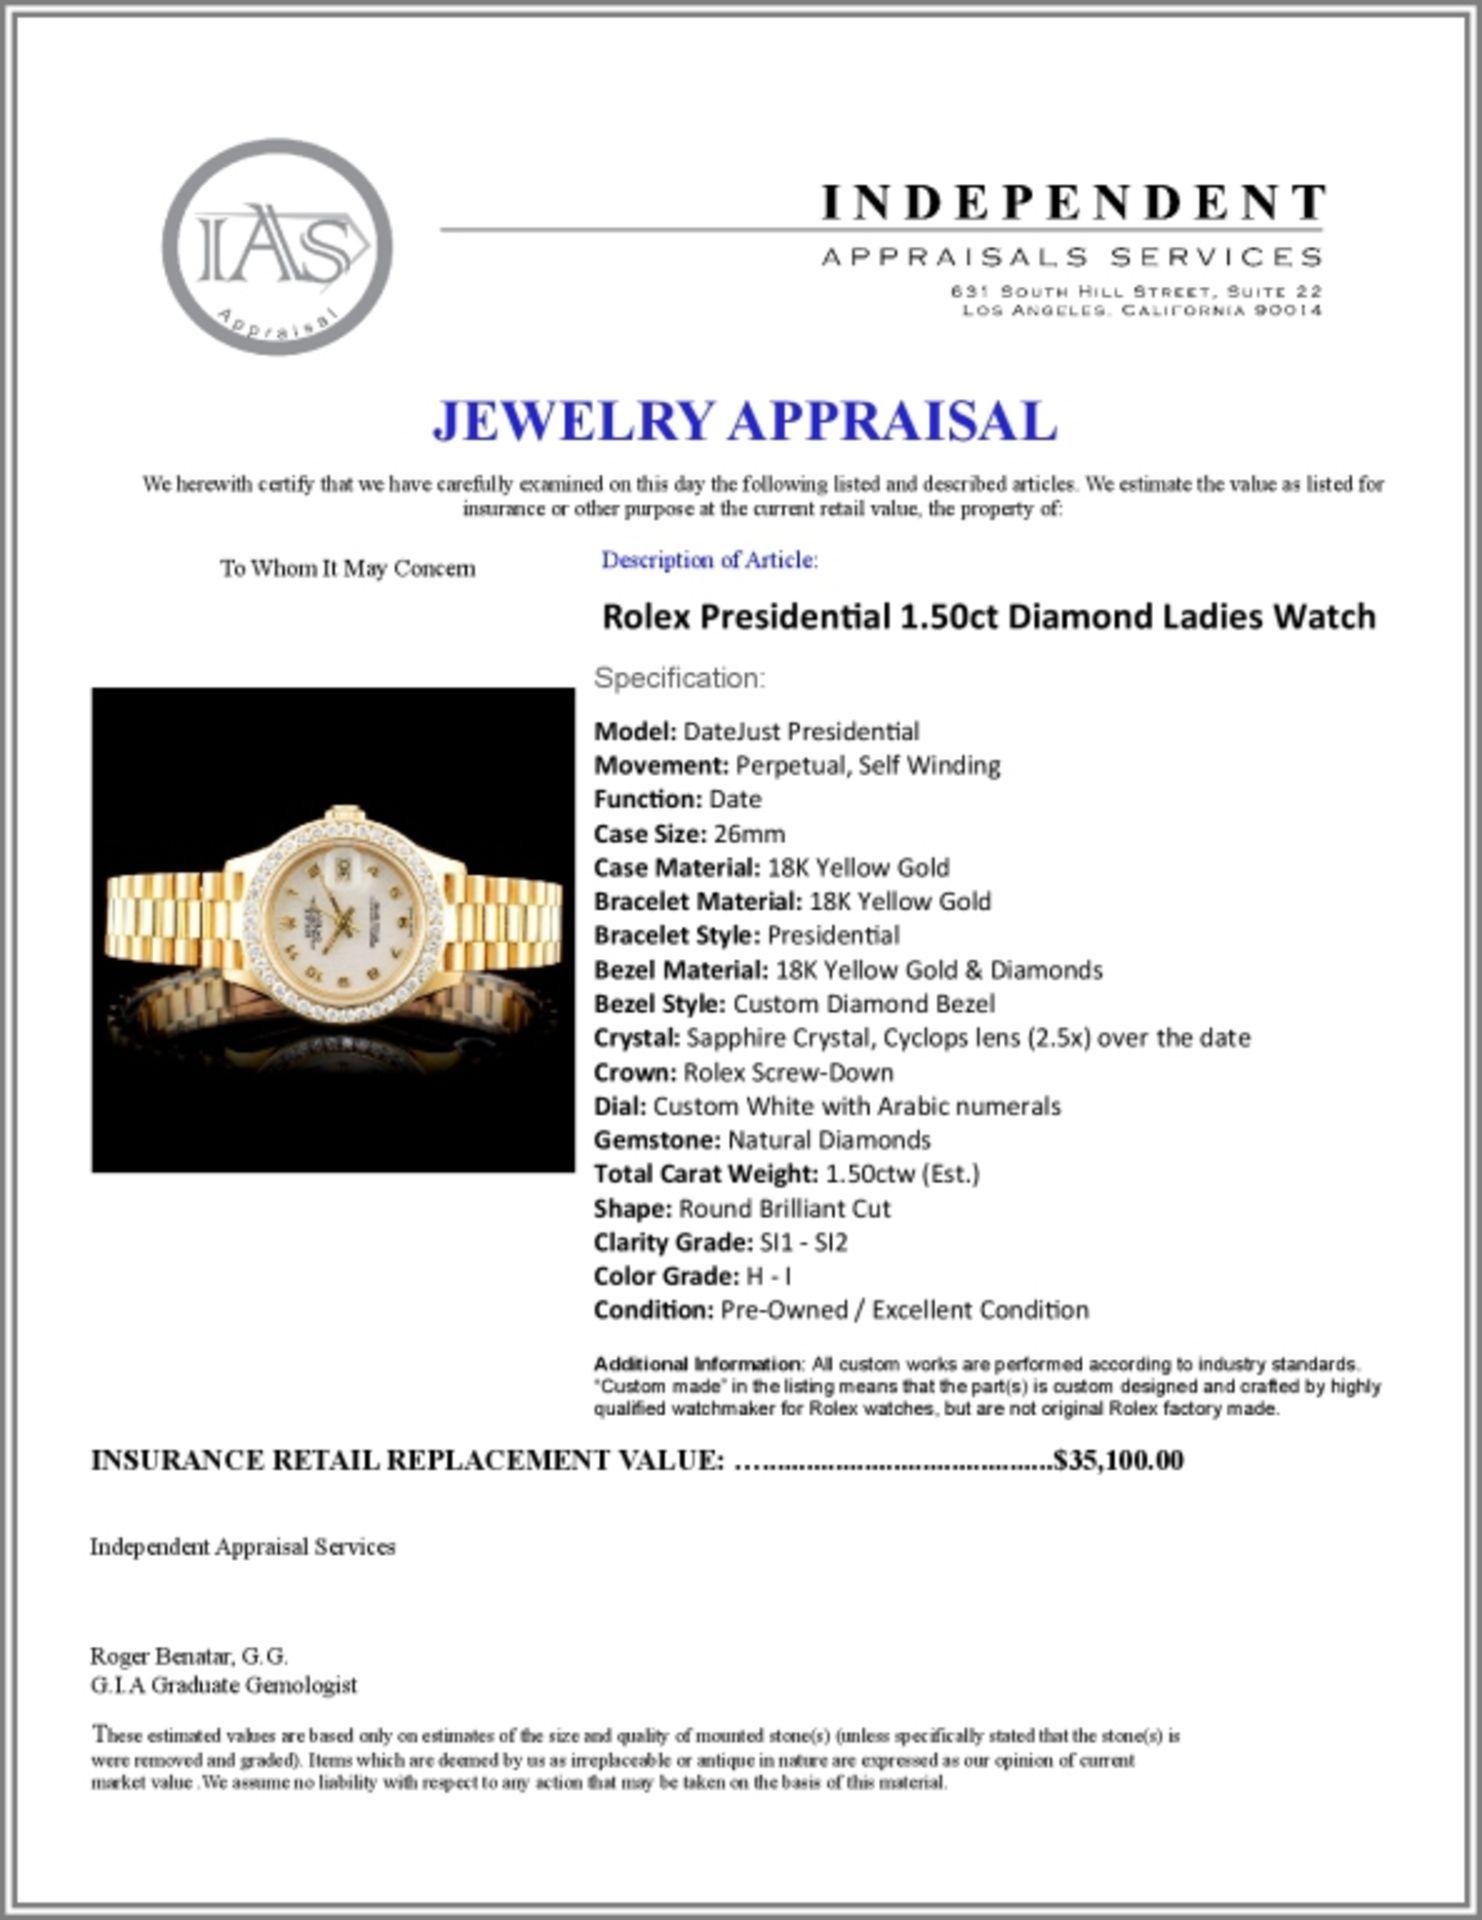 Rolex Presidential Diamond Ladies Watch - Image 6 of 6